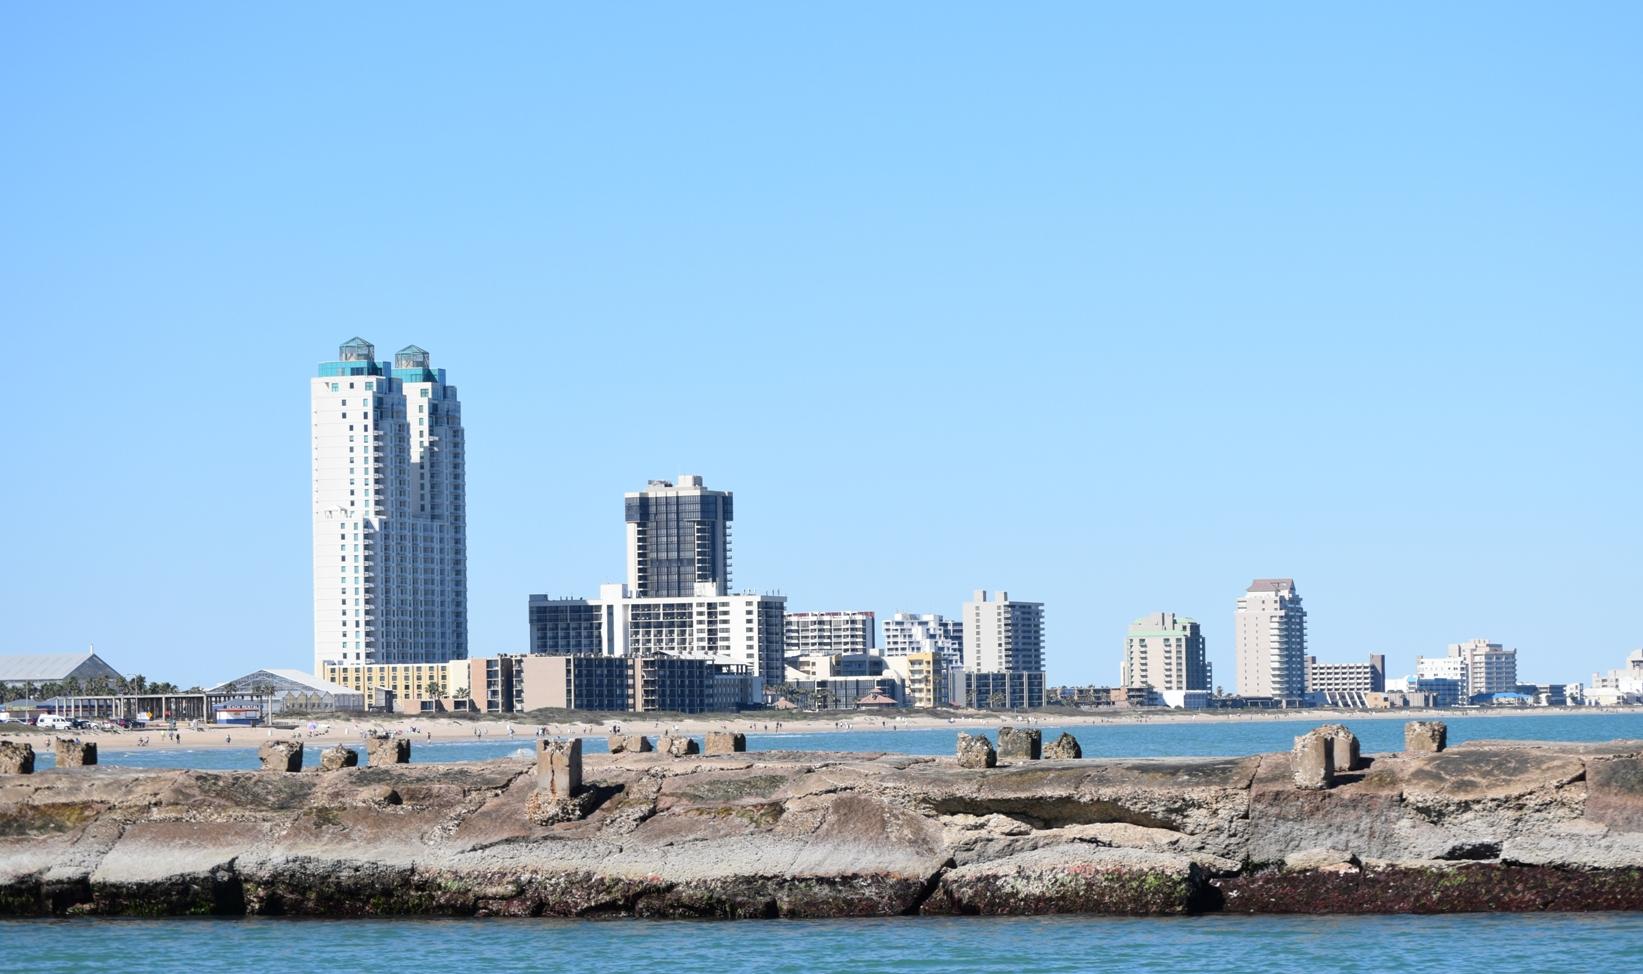 Shoreline with beach and ocean